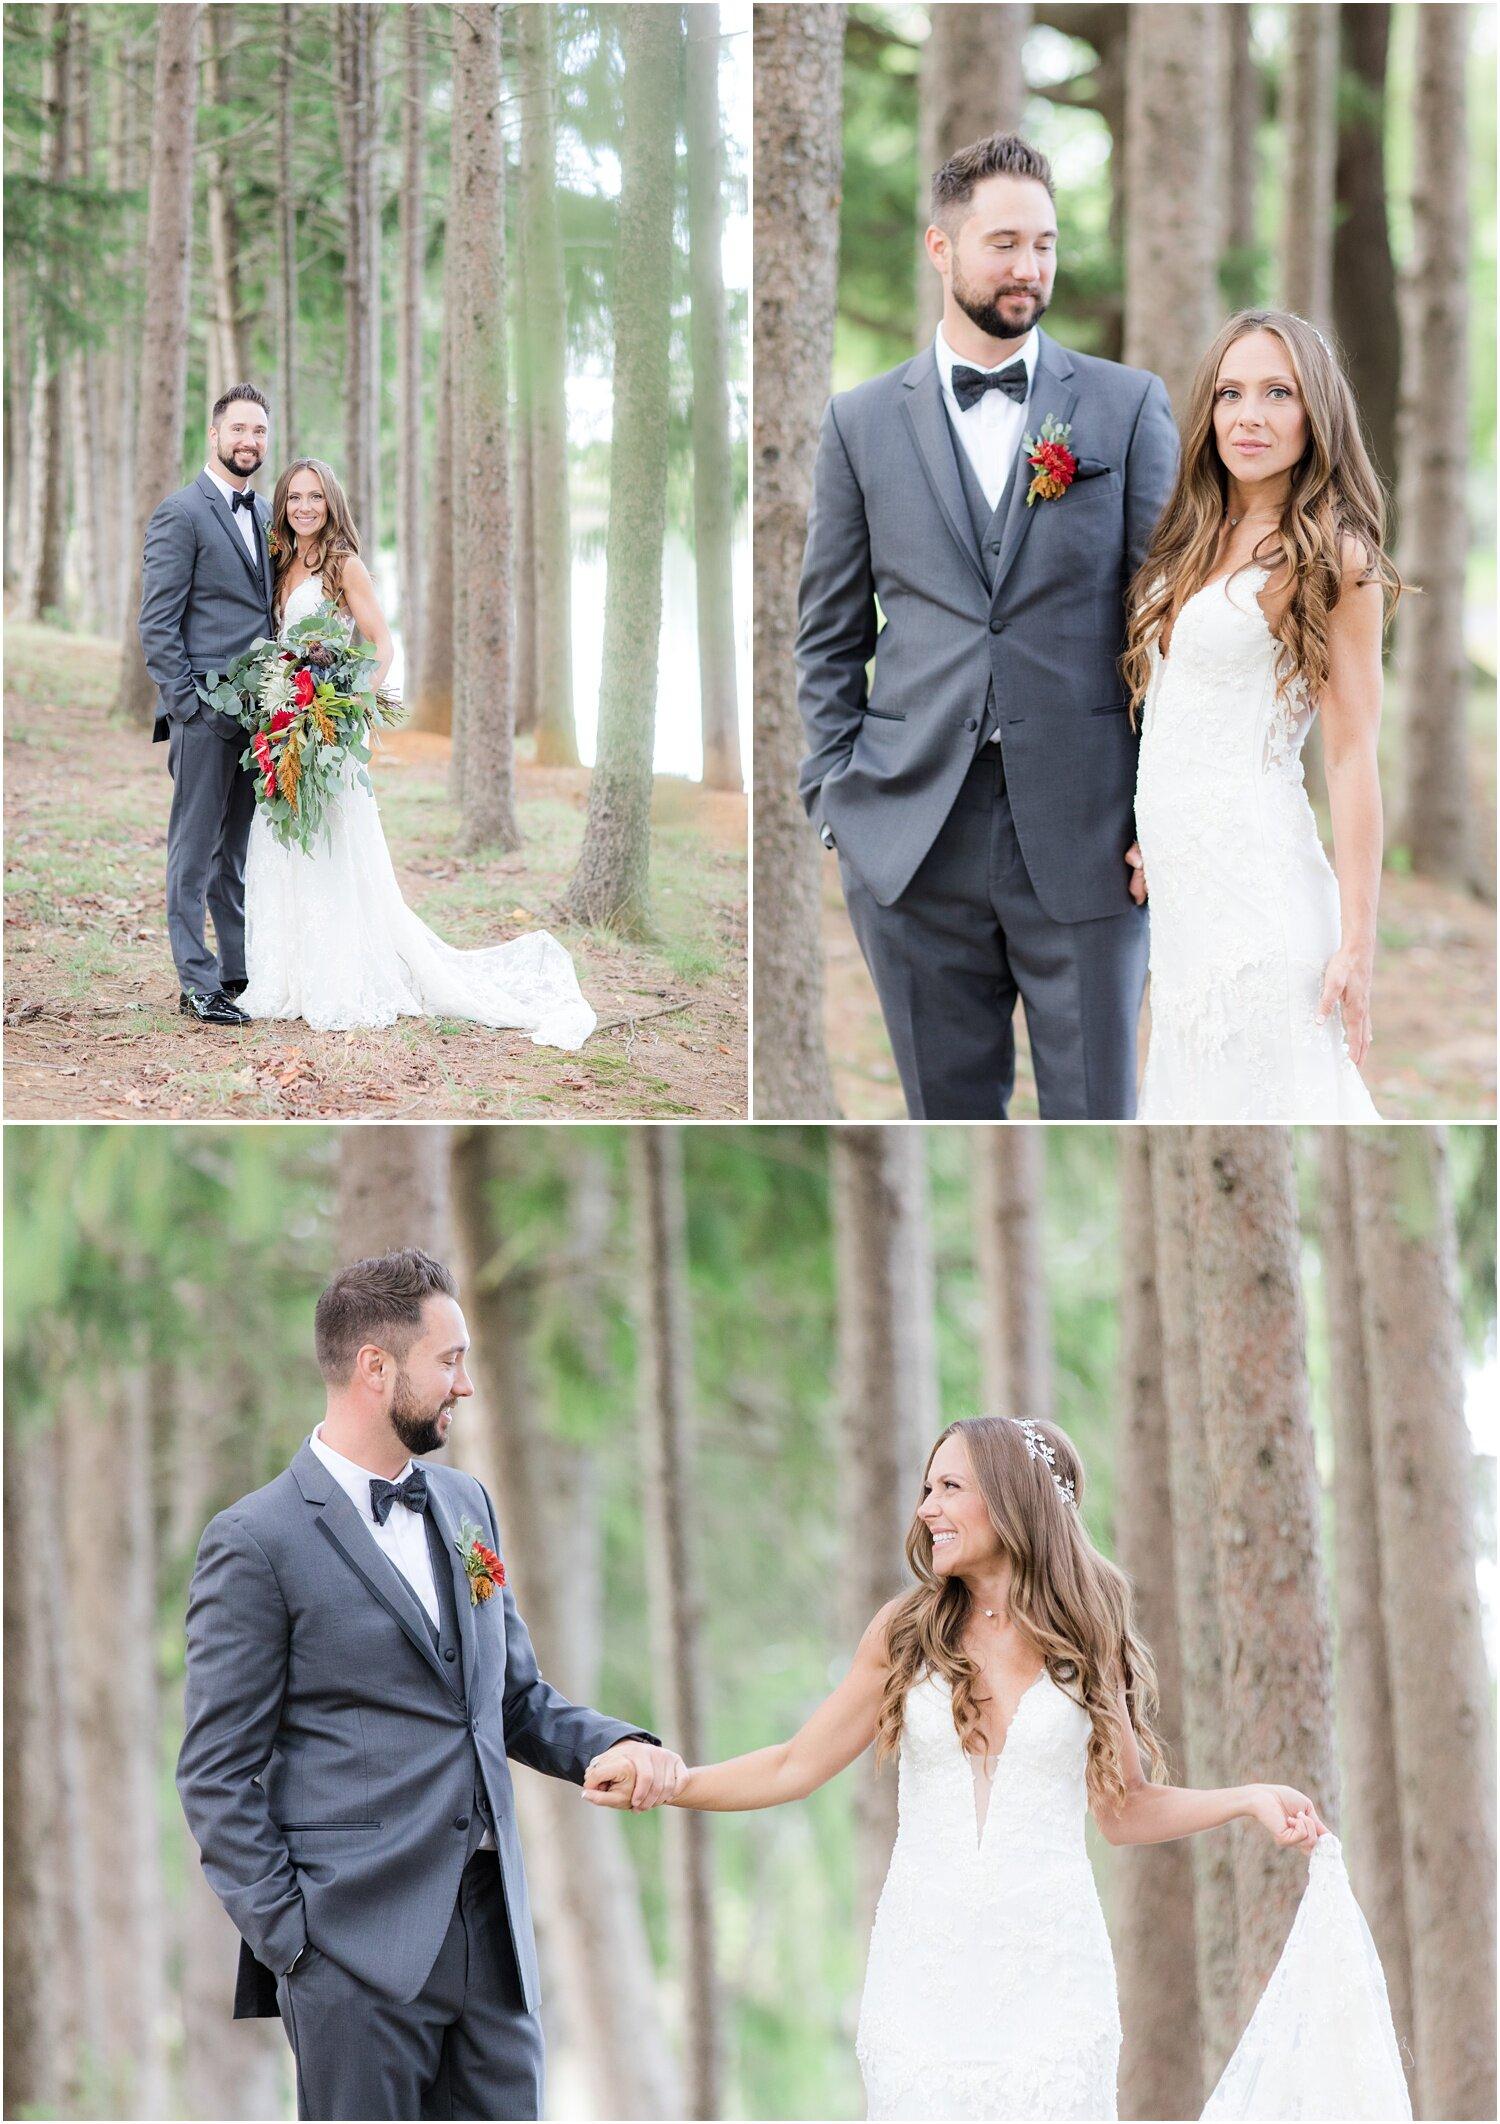 Romantic wedding photos in the forrest at rustic nj wedding venue